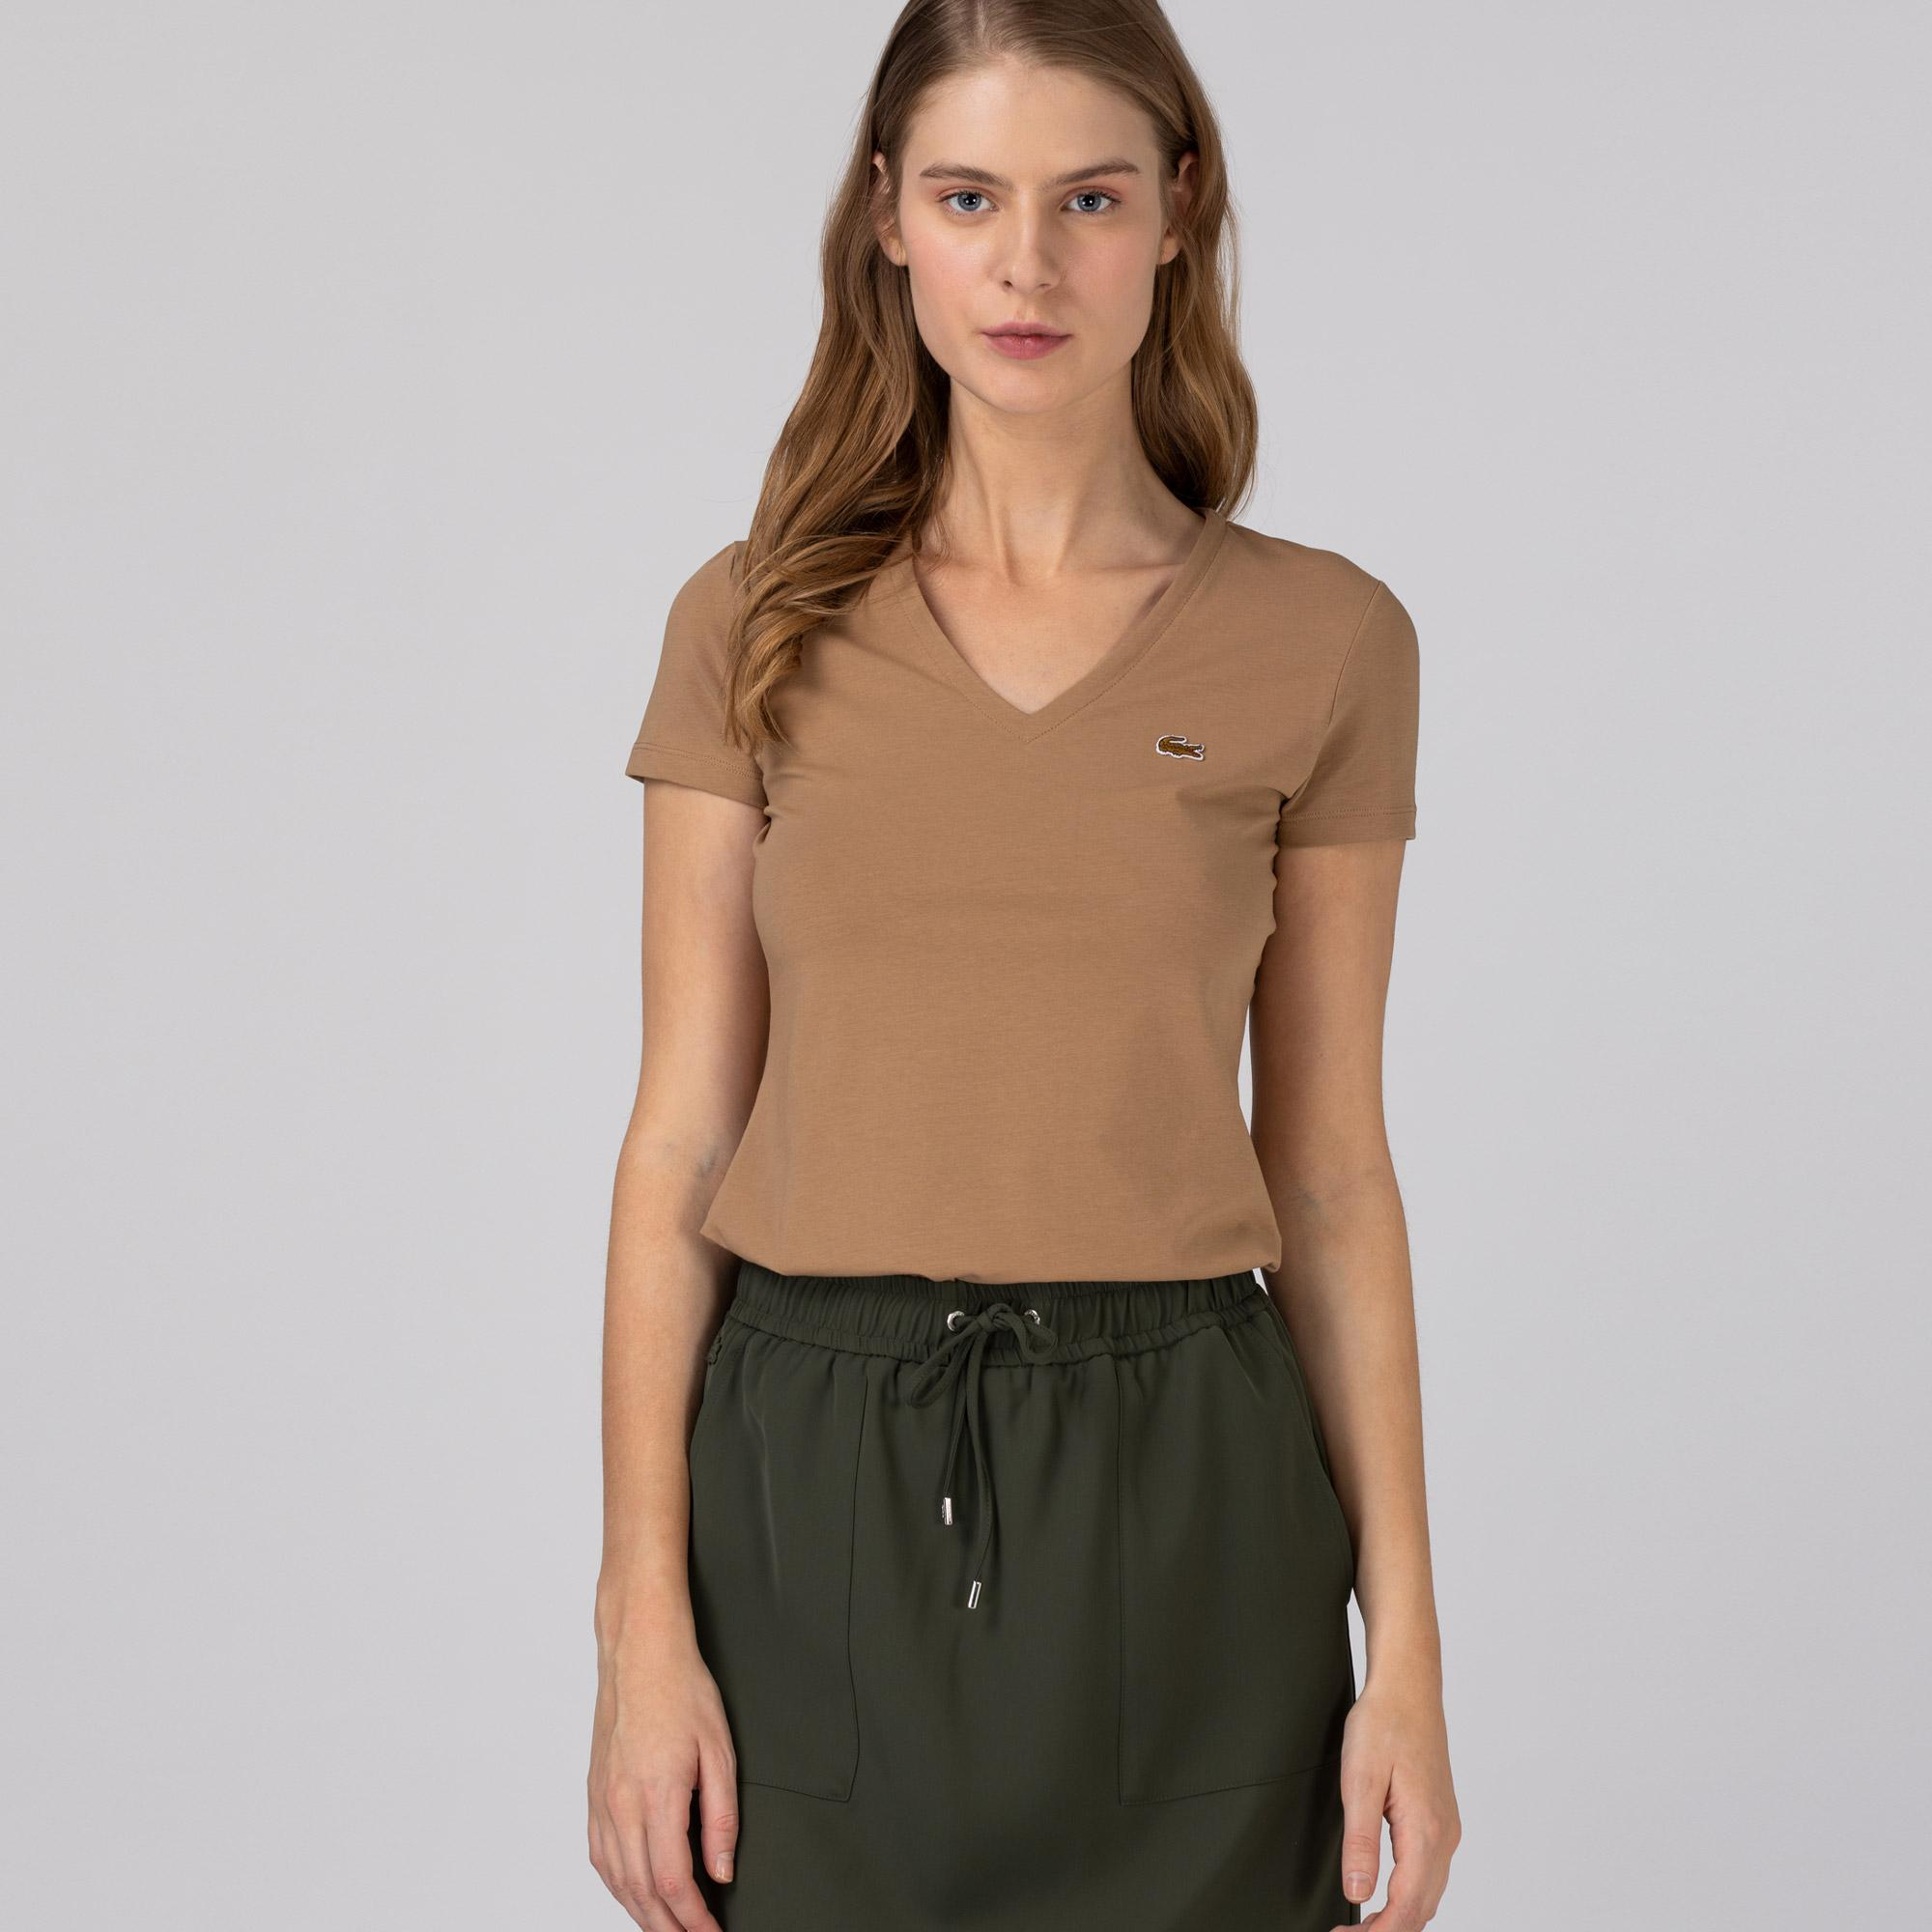 Lacoste Kadın Slim Fit V Yaka Bej T-Shirt